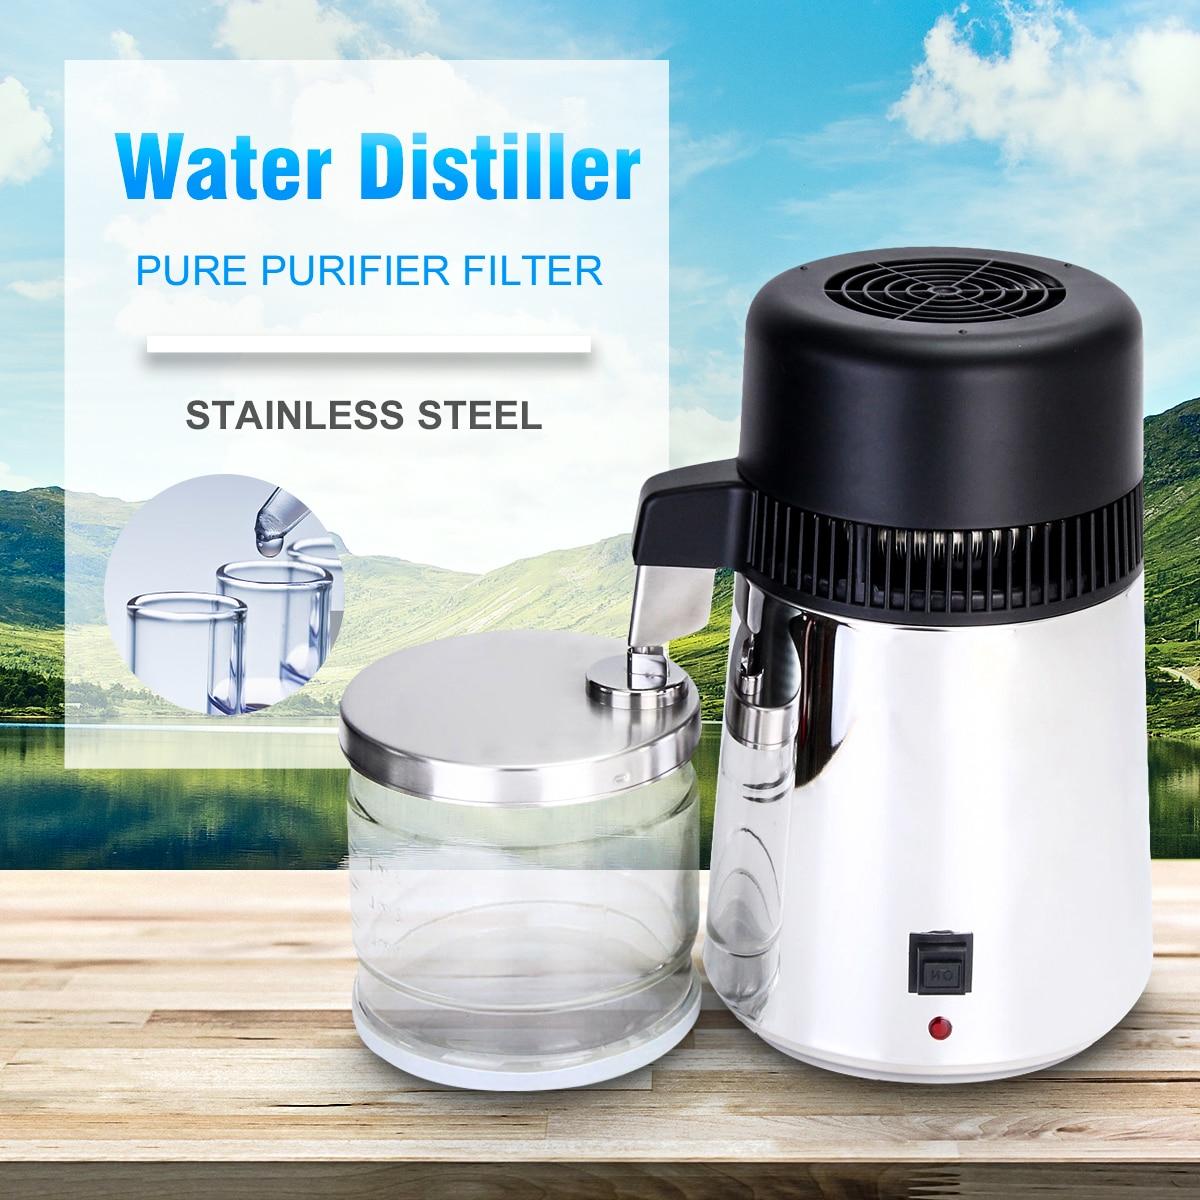 750 w 4L Capaciteit Zuiver Water Distilleerder Purifier 304 Rvs Container Filter Gedestilleerd Water Apparaat 220 v